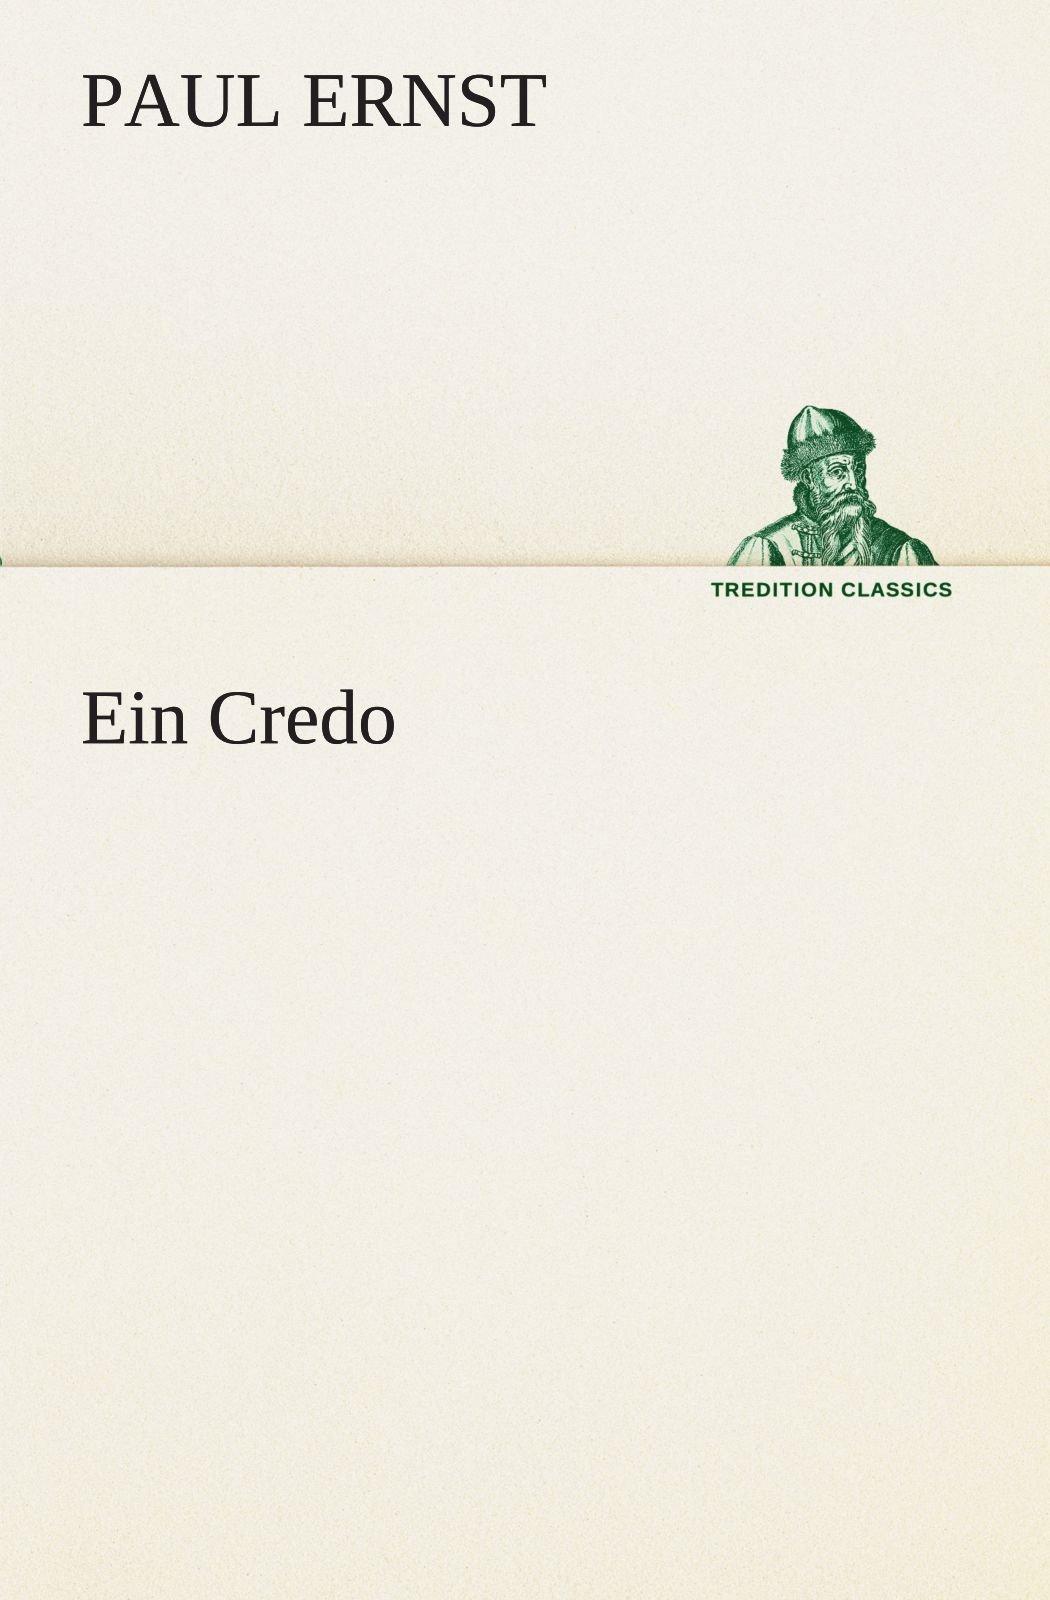 Ein Credo (TREDITION CLASSICS) (German Edition) pdf epub